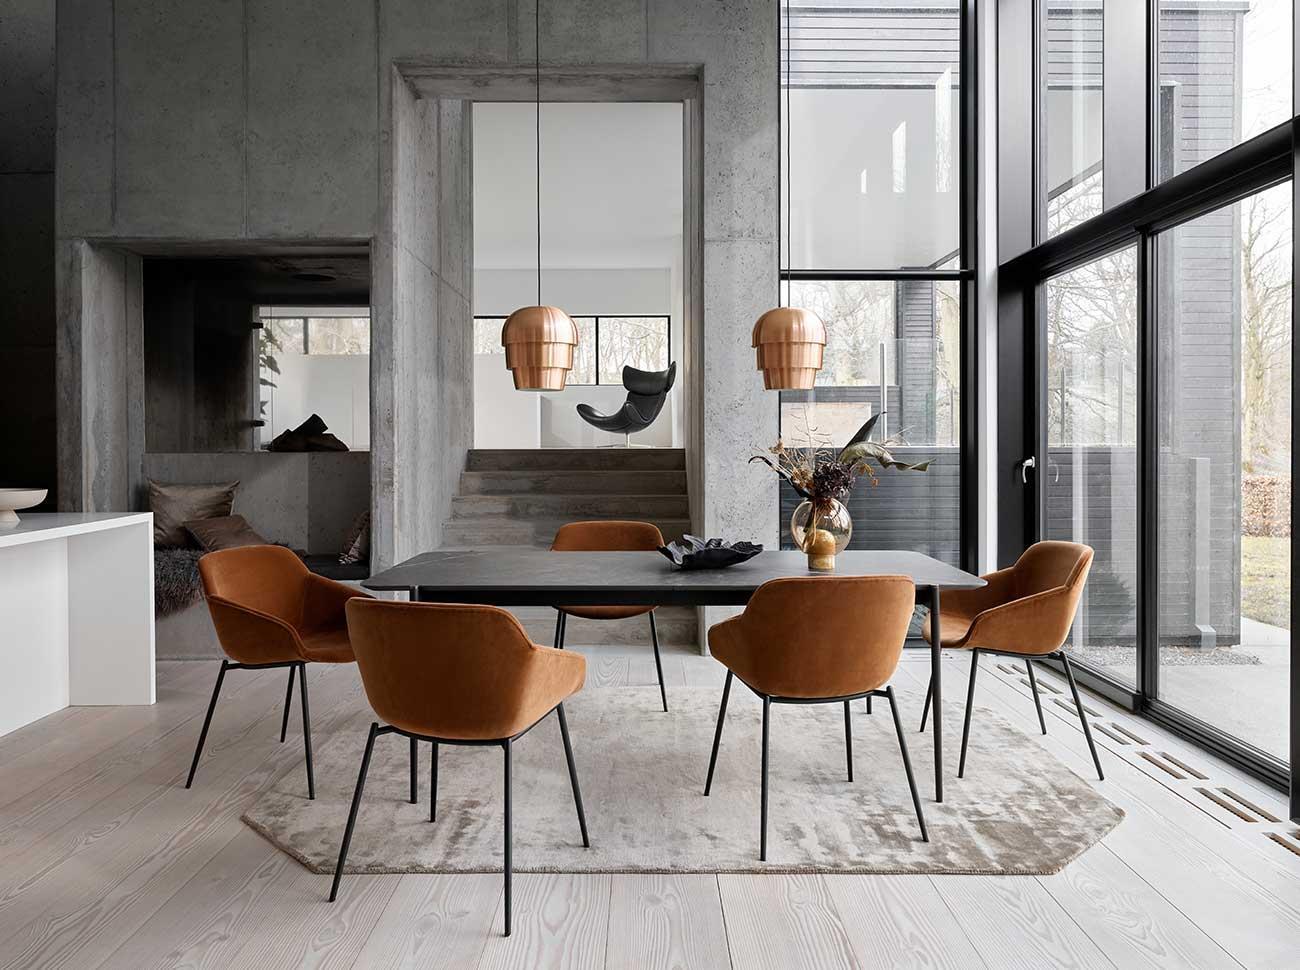 Design Stühle Drehbar